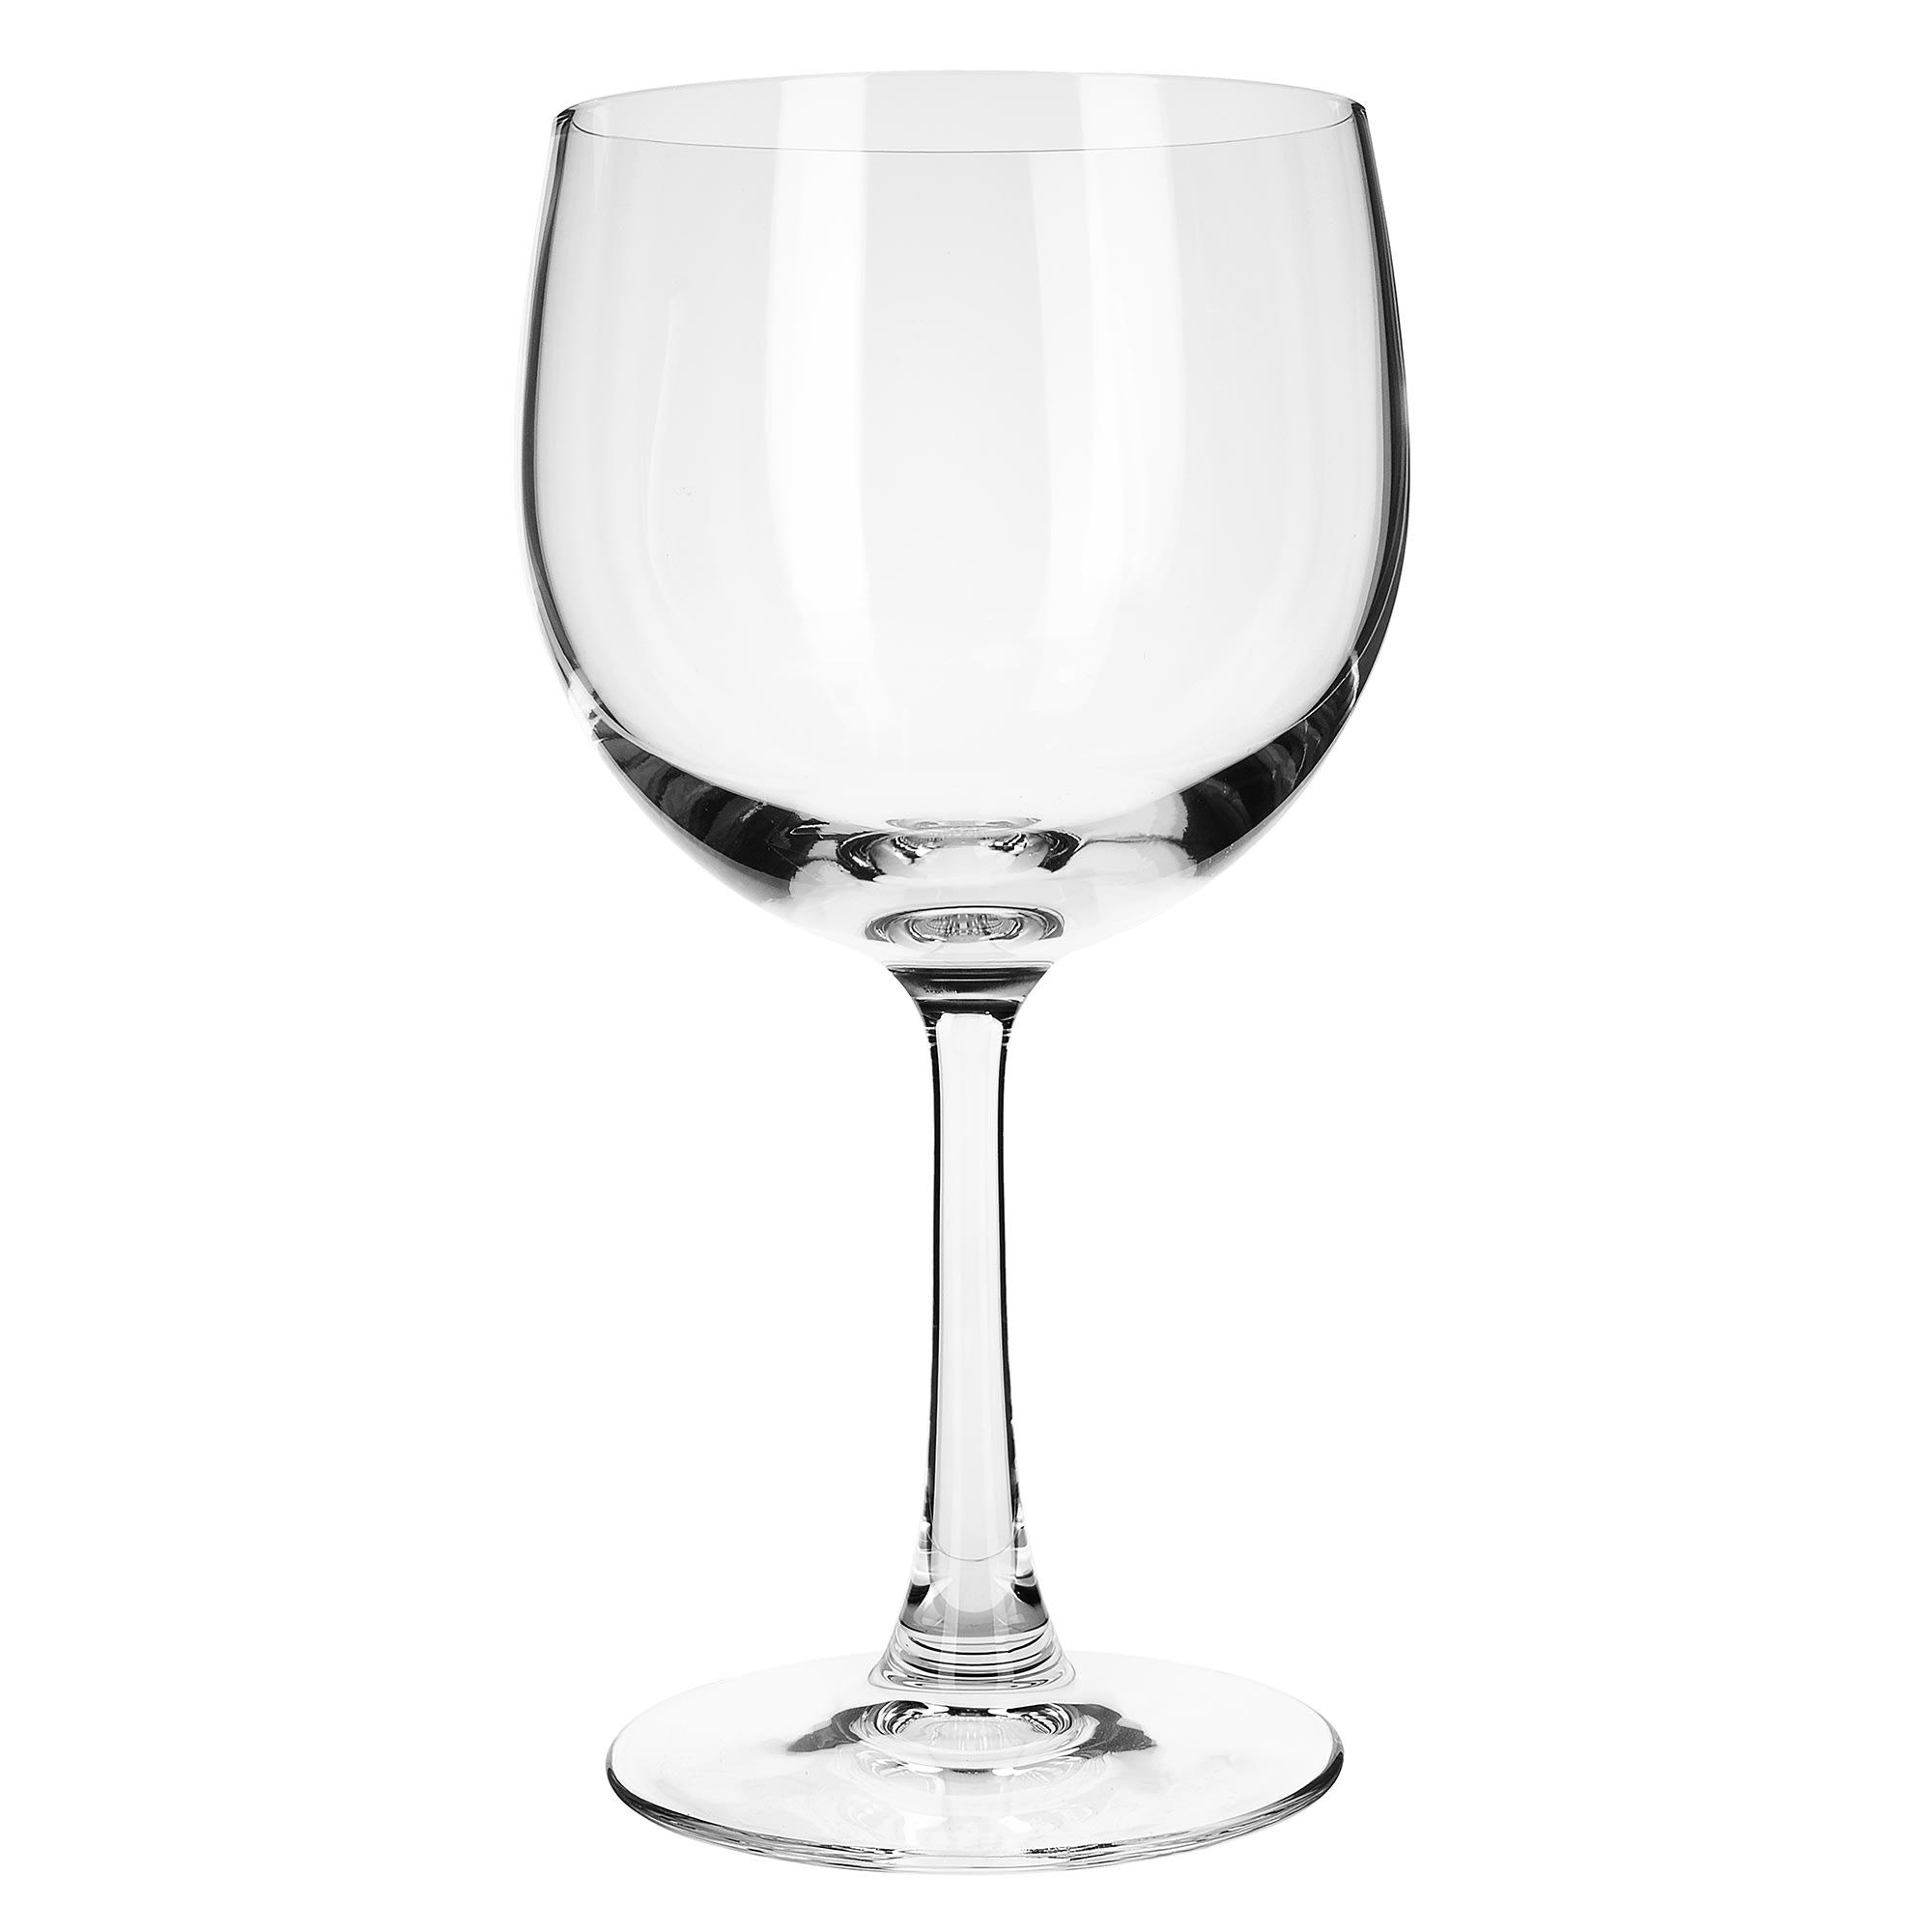 Libbey 8515SR 16 oz Bristol Valley Round Wine Glass - Sheer Rim